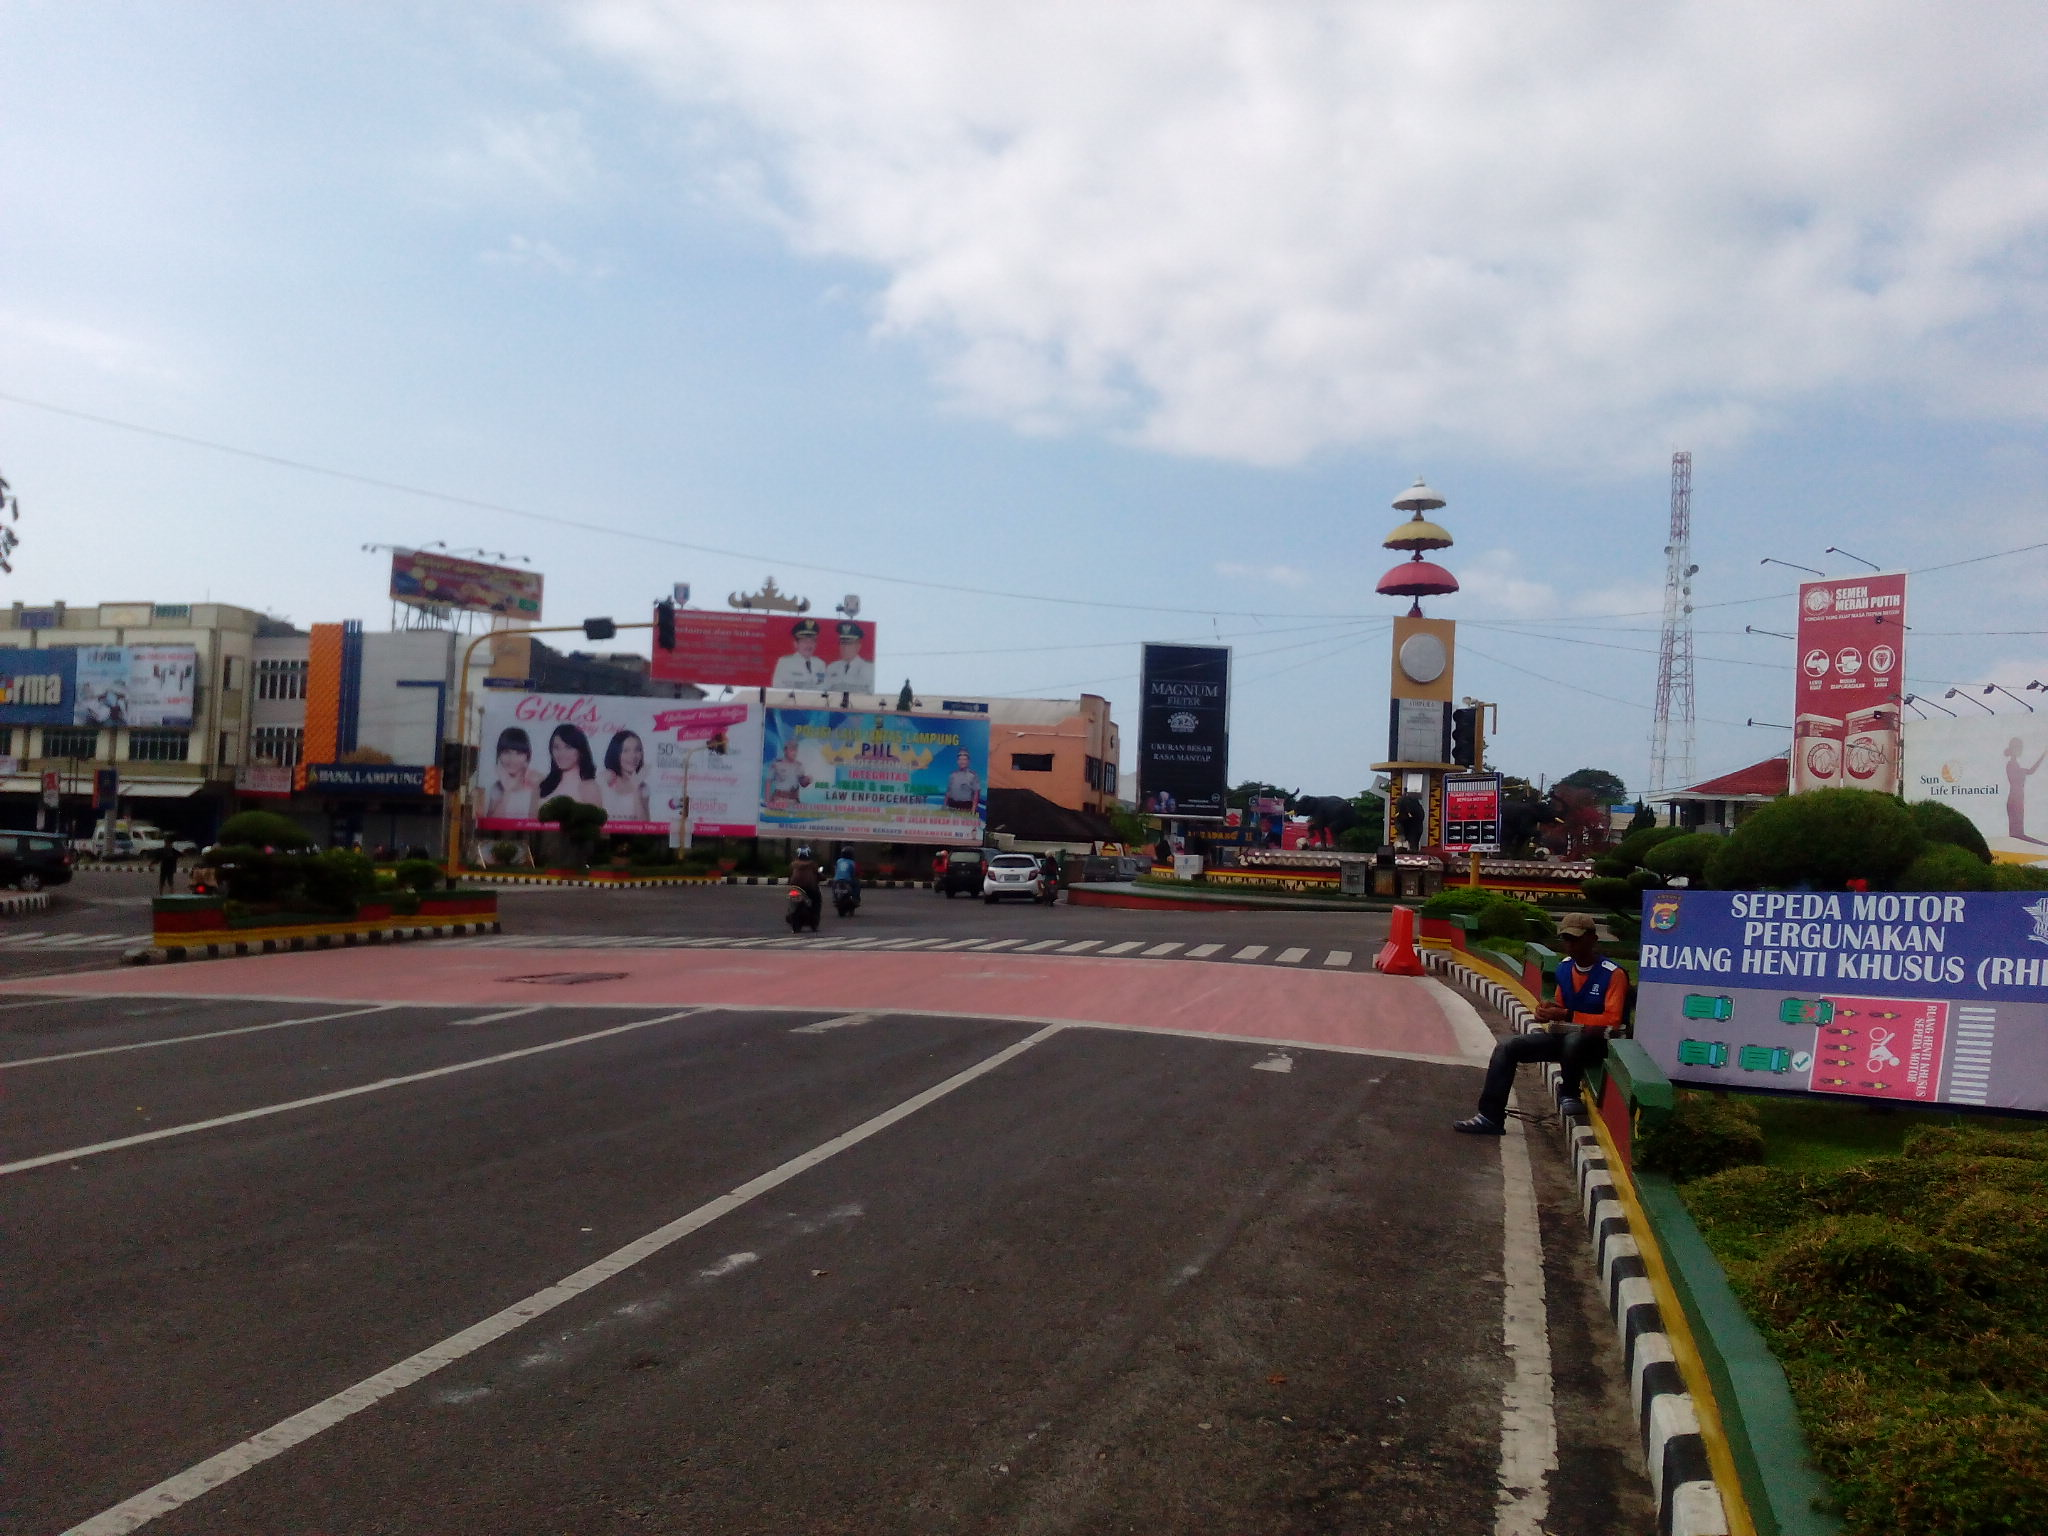 Hari Raya Nyepi Kondisi Lalin Pagi Kota Bandar Lampung Lengang